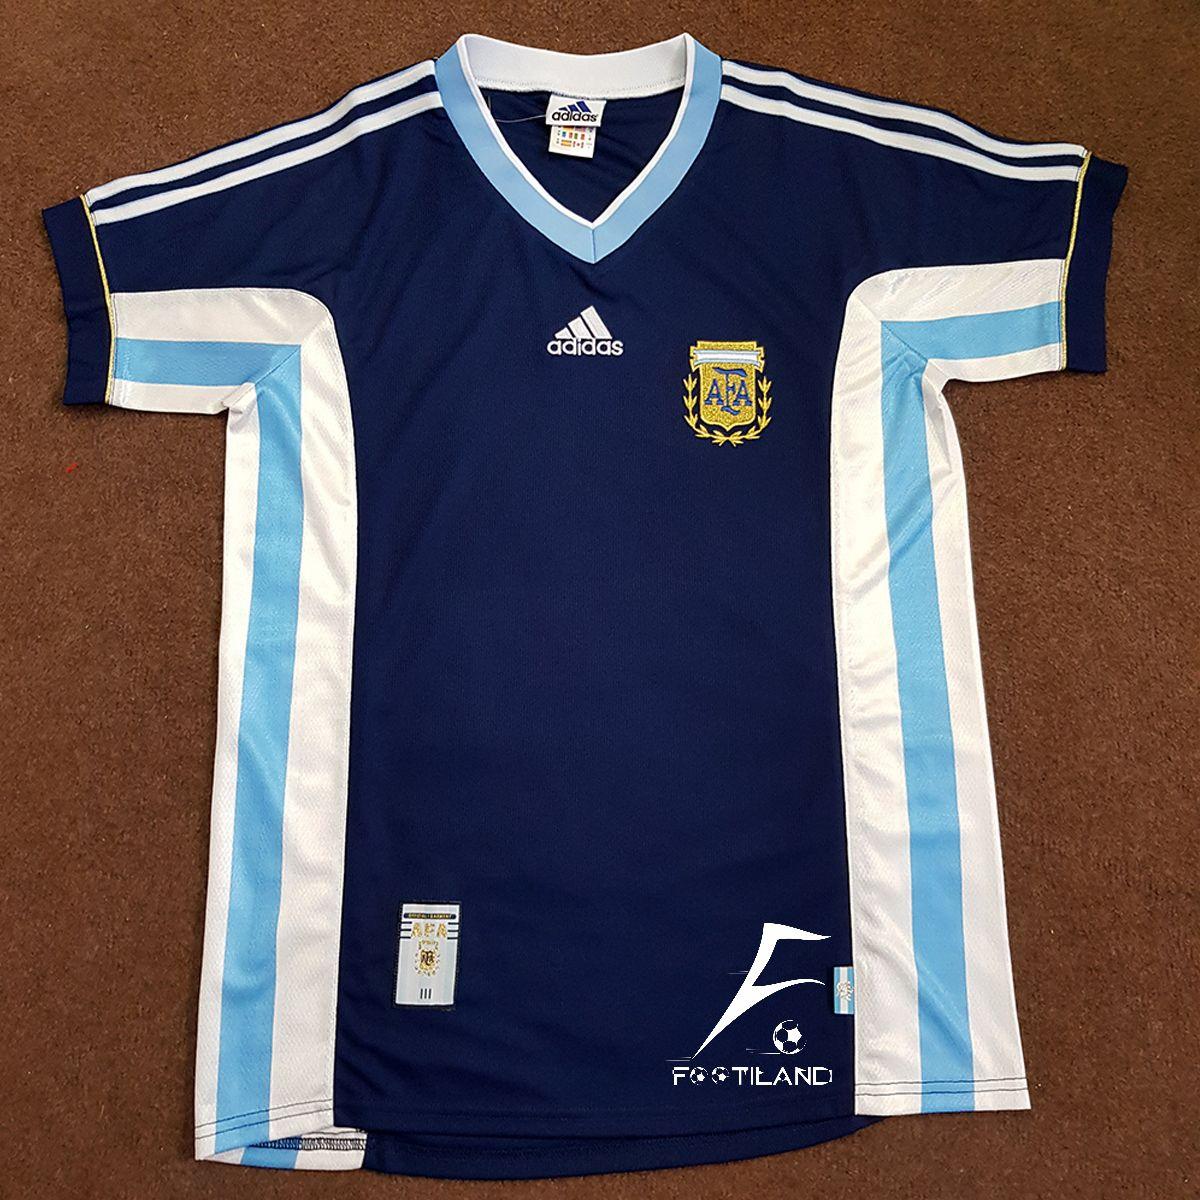 لباس کلاسیک دوم آرژانتین 1998